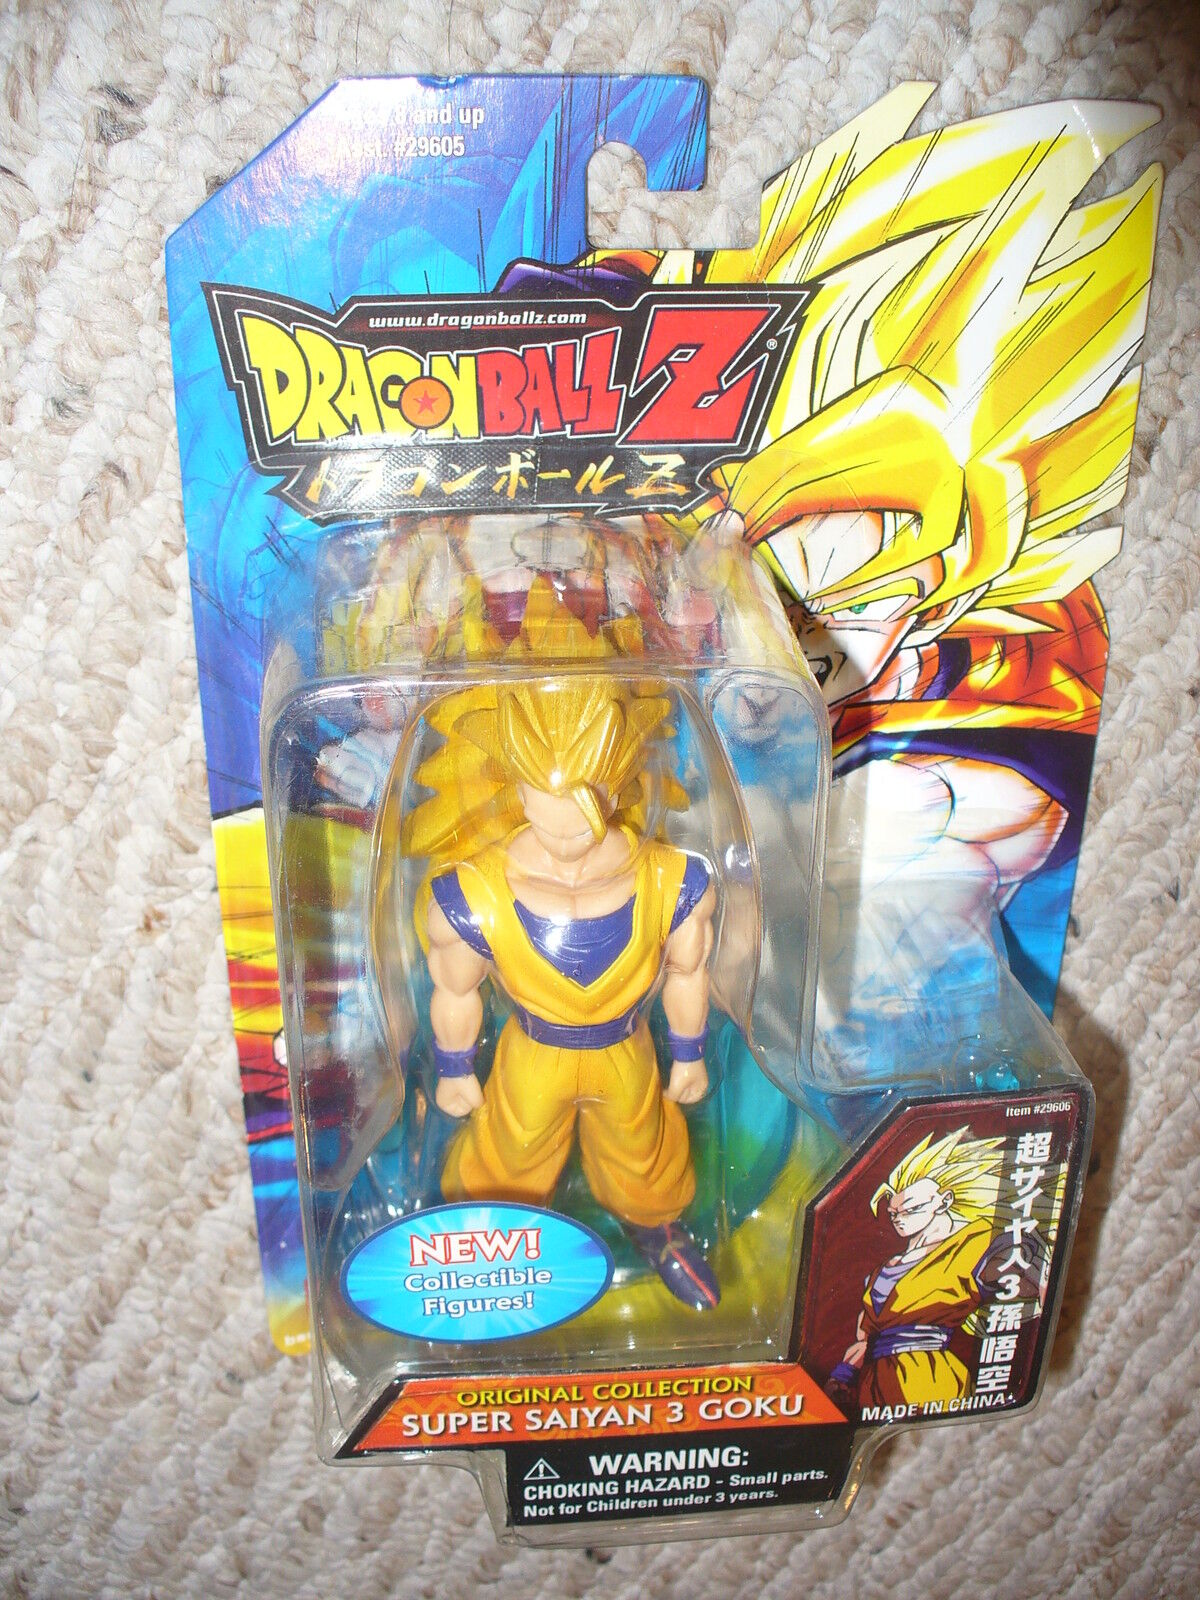 BanDai Dragonbtutti Z Original Collection Super Saiyan  3 Goku 4.5  cifra - 2007  ultimi stili